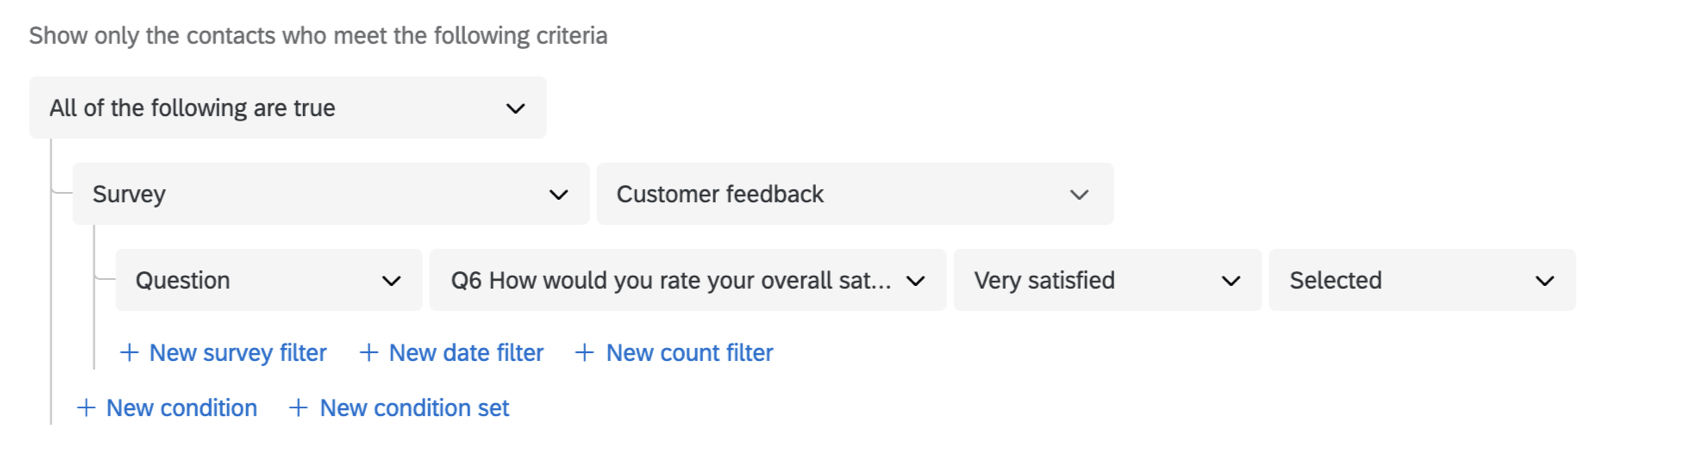 setting segment criteria based on a survey question